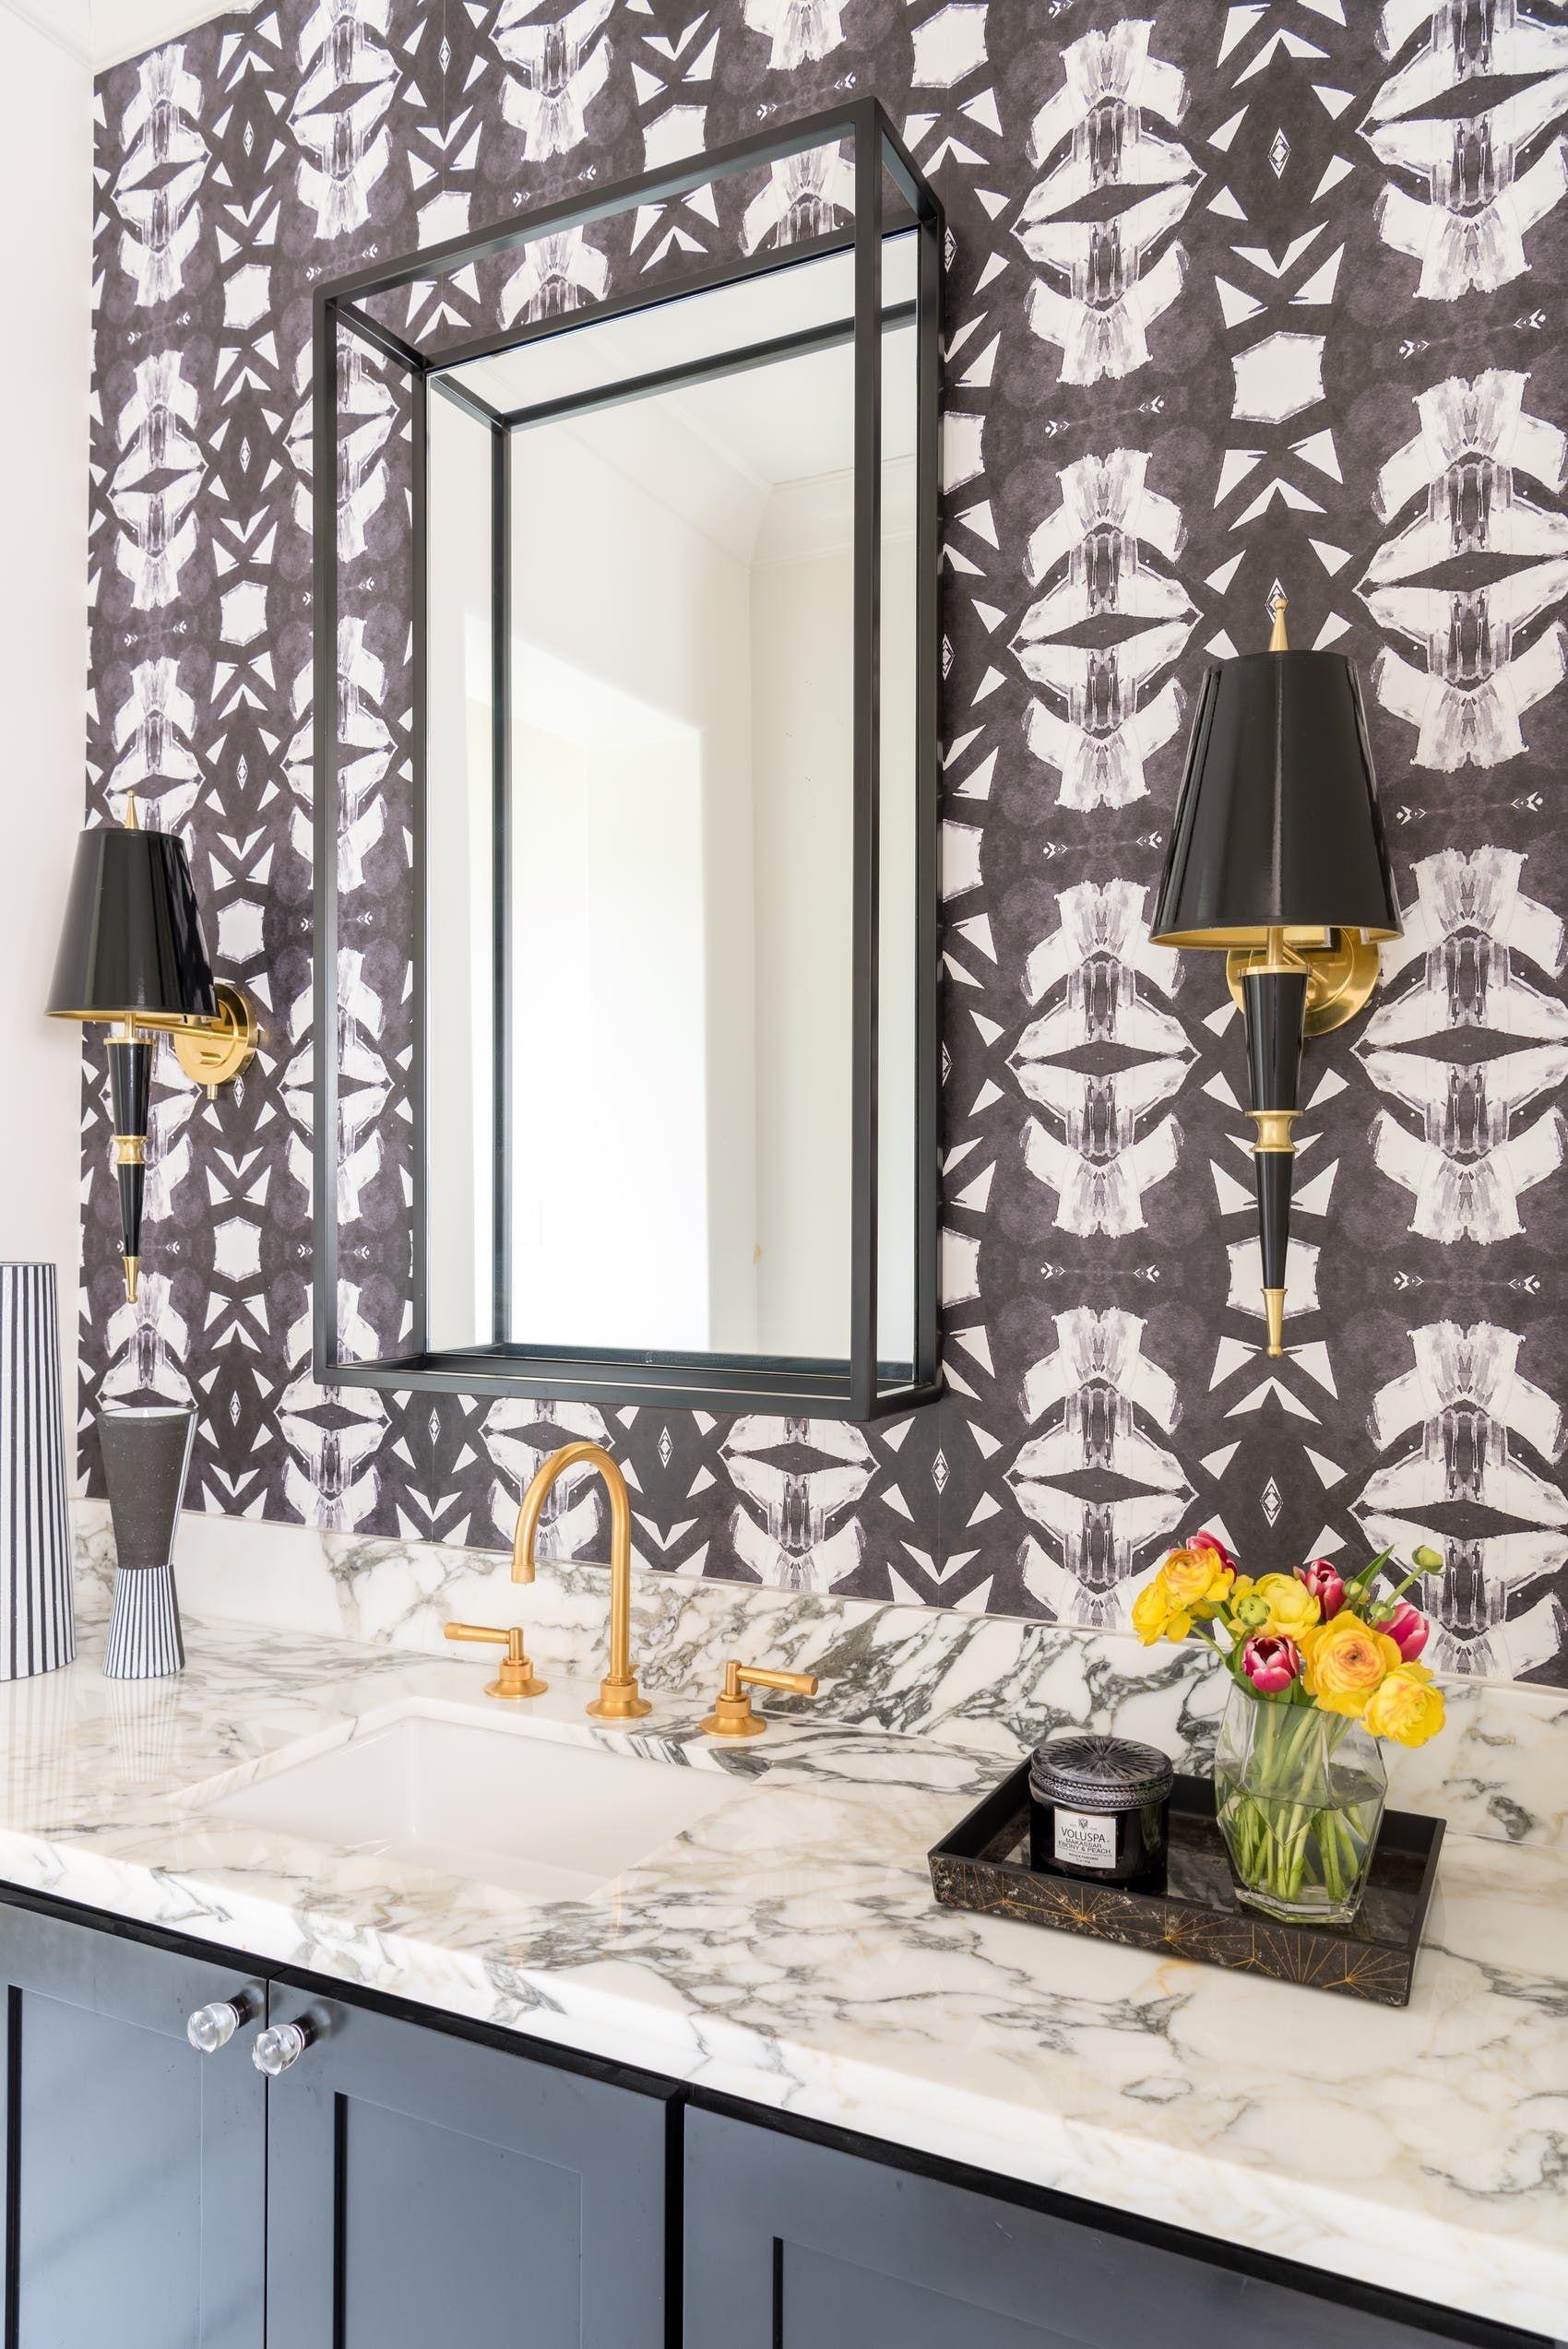 Gorgeous Bathroom Featuring Custom Wallpaper And Gold And Crystal Hardware By Laura U Inc Lookbook Derin Bathroom Mirror Stylish Bathroom Bathroom Design